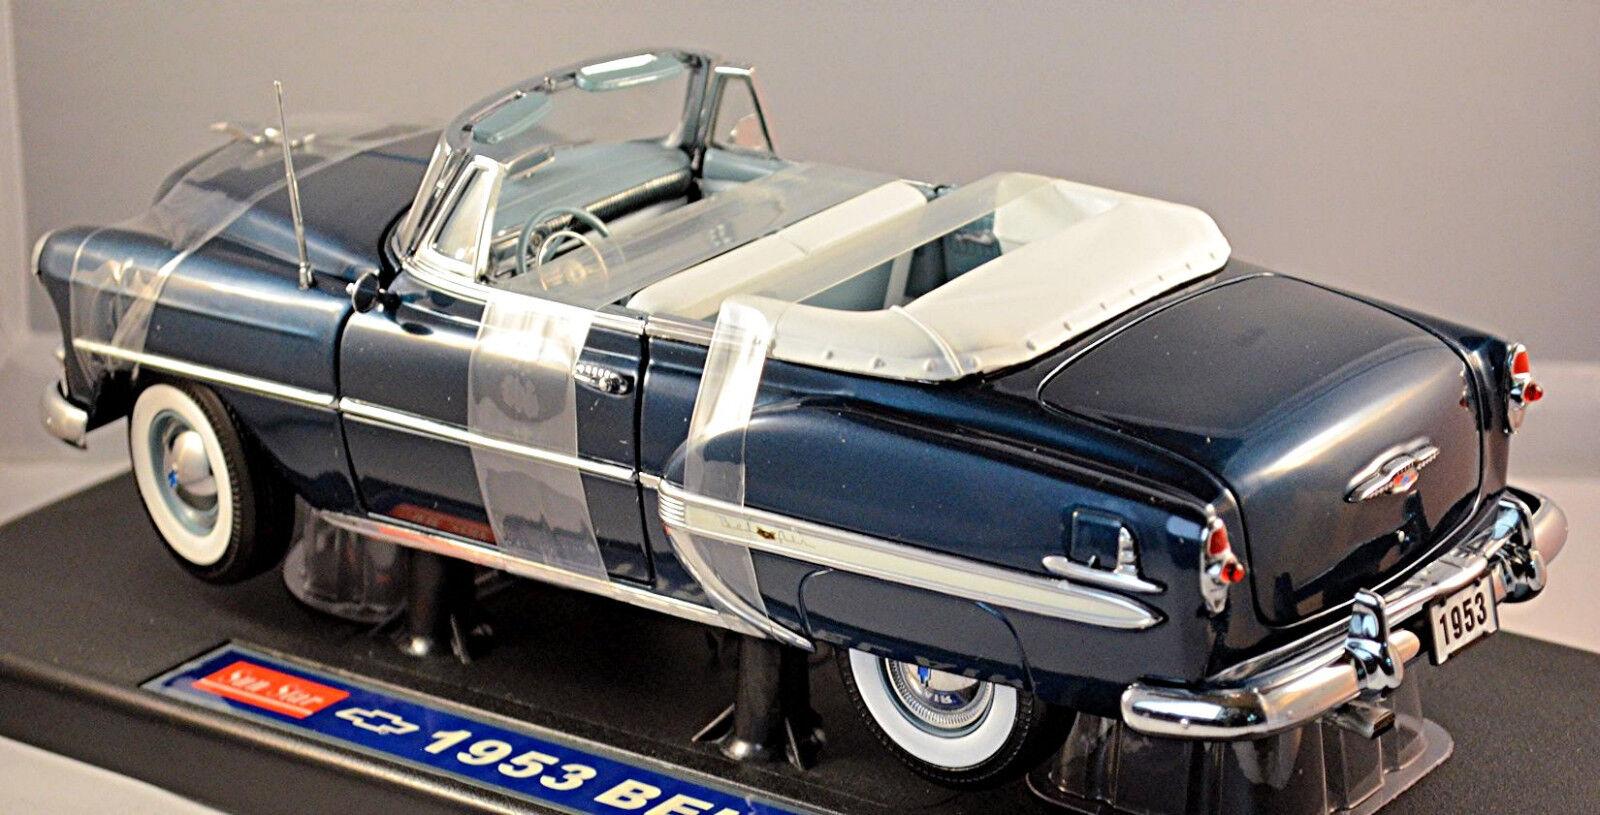 CHEVROLET Bel Air 2400c Cabriolet 1953 BLU blu STAR METALLIC 1 18 SUN STAR blu 90d205